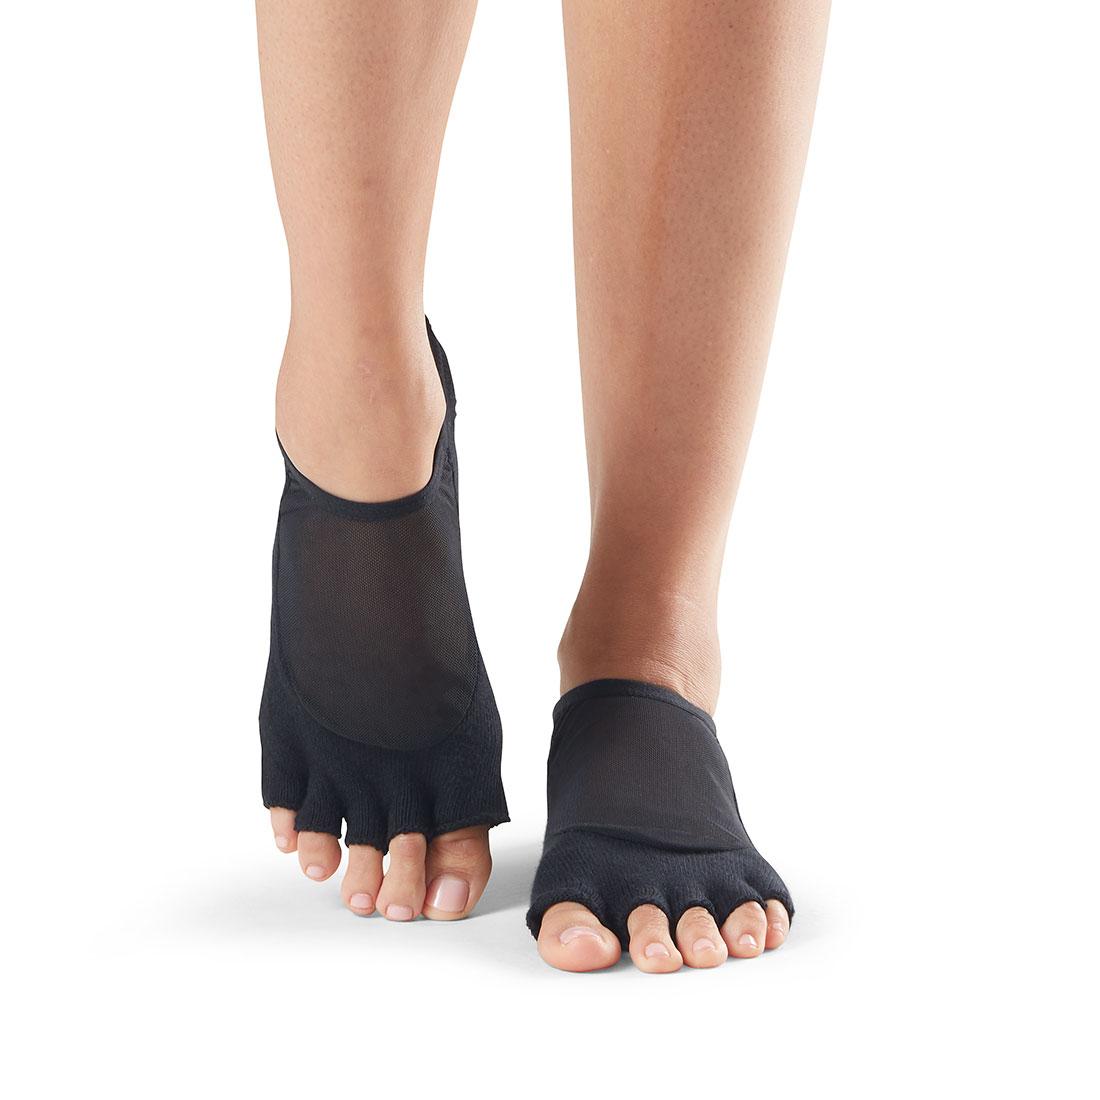 Yogasocken ToeSox Luna Half Toe Black - 1